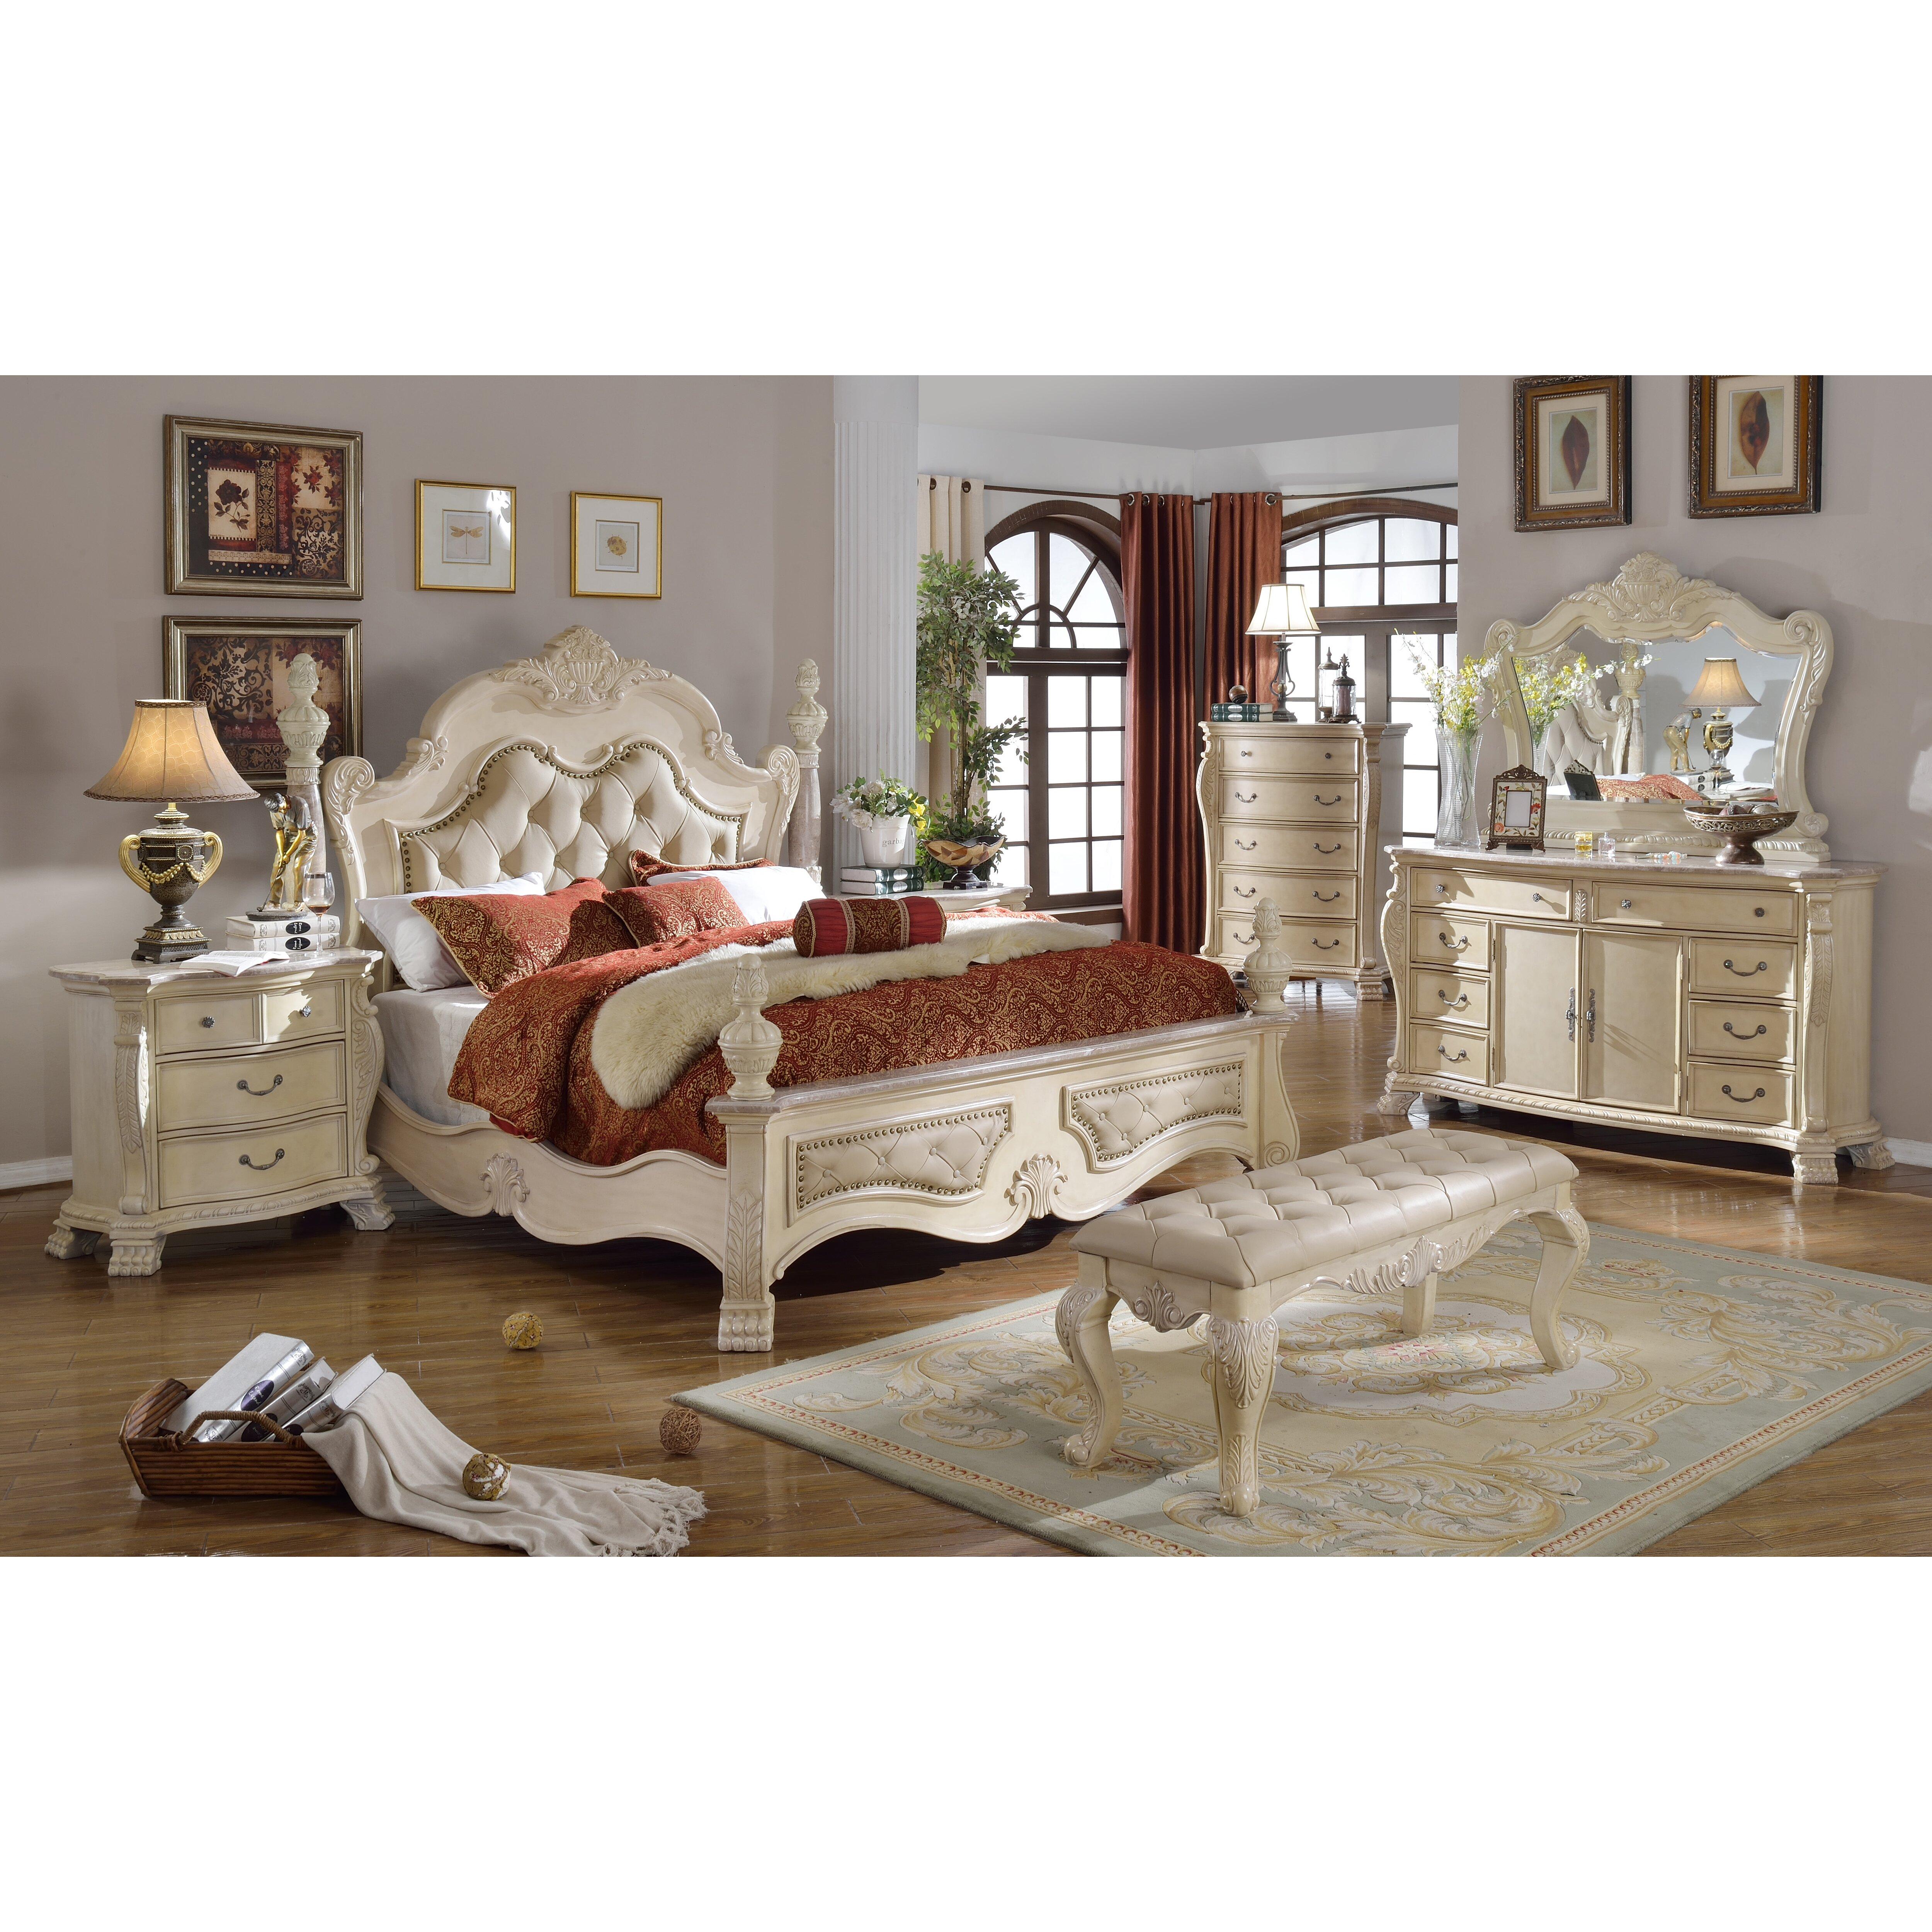 White Furniture Bedroom Set Home Decoration Ideas